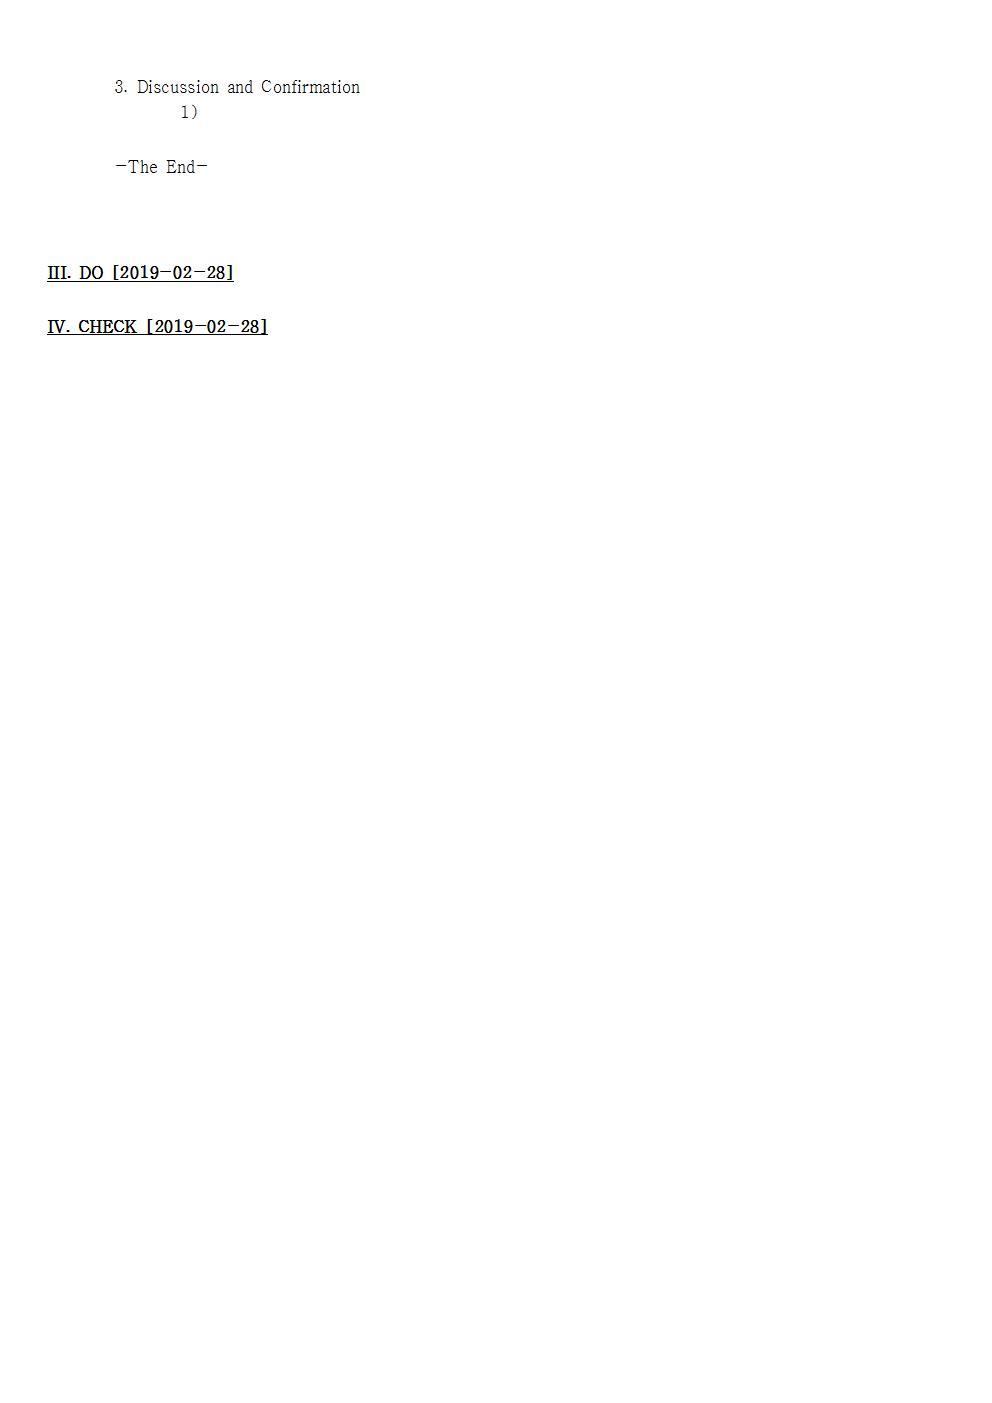 D-[19-002-RD-02]-[PRISM2.0-ADOxx]-[2019-02-25]-[MR]002.jpg